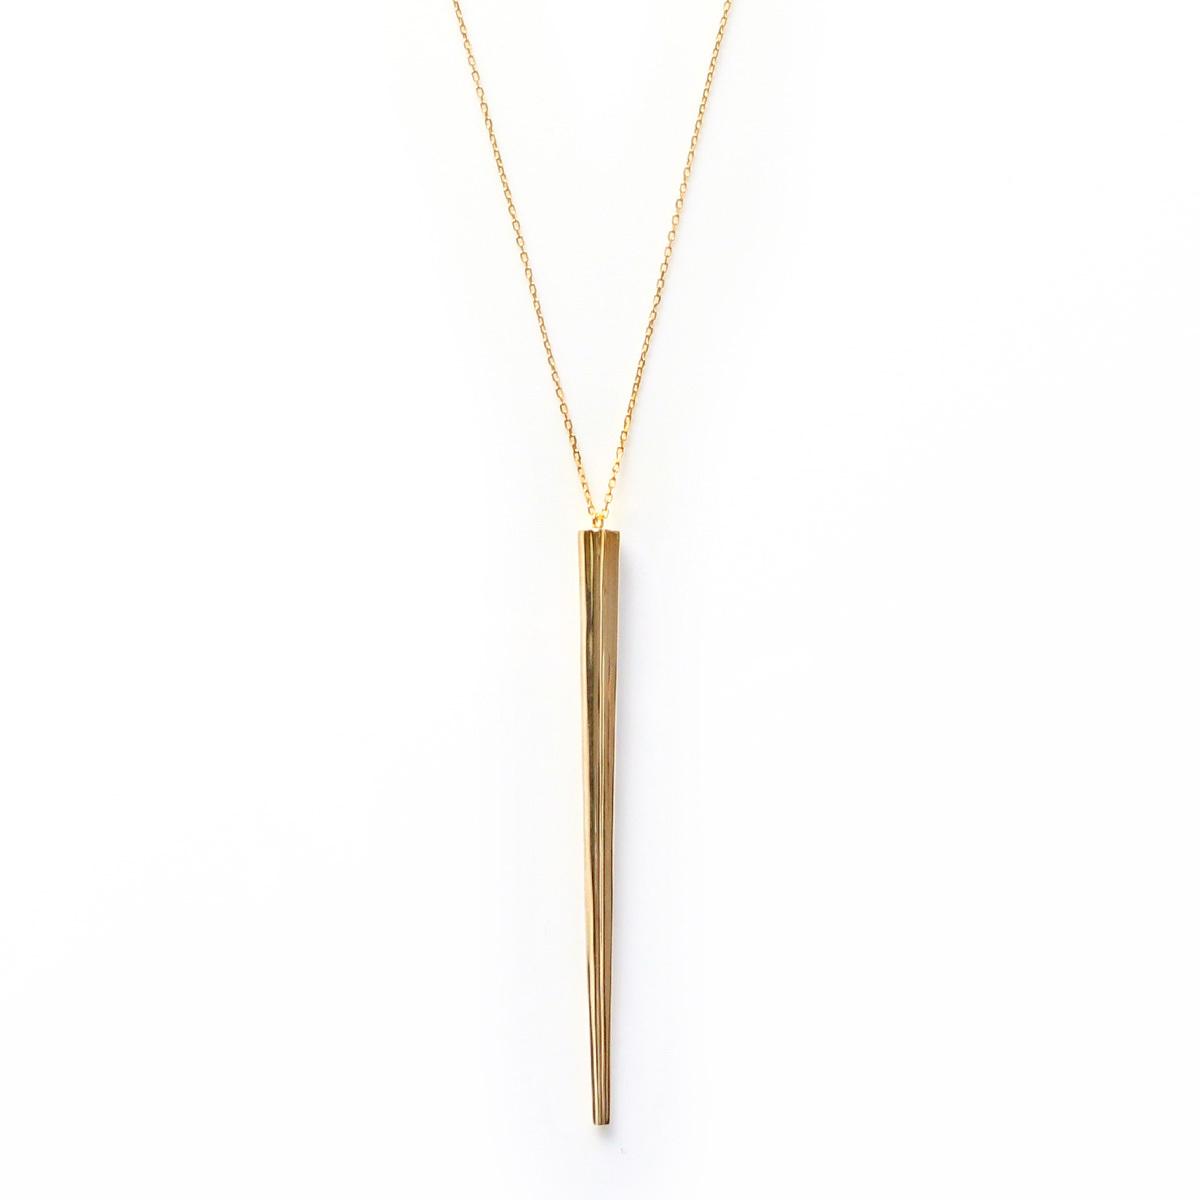 Yuragi Bar Necklace